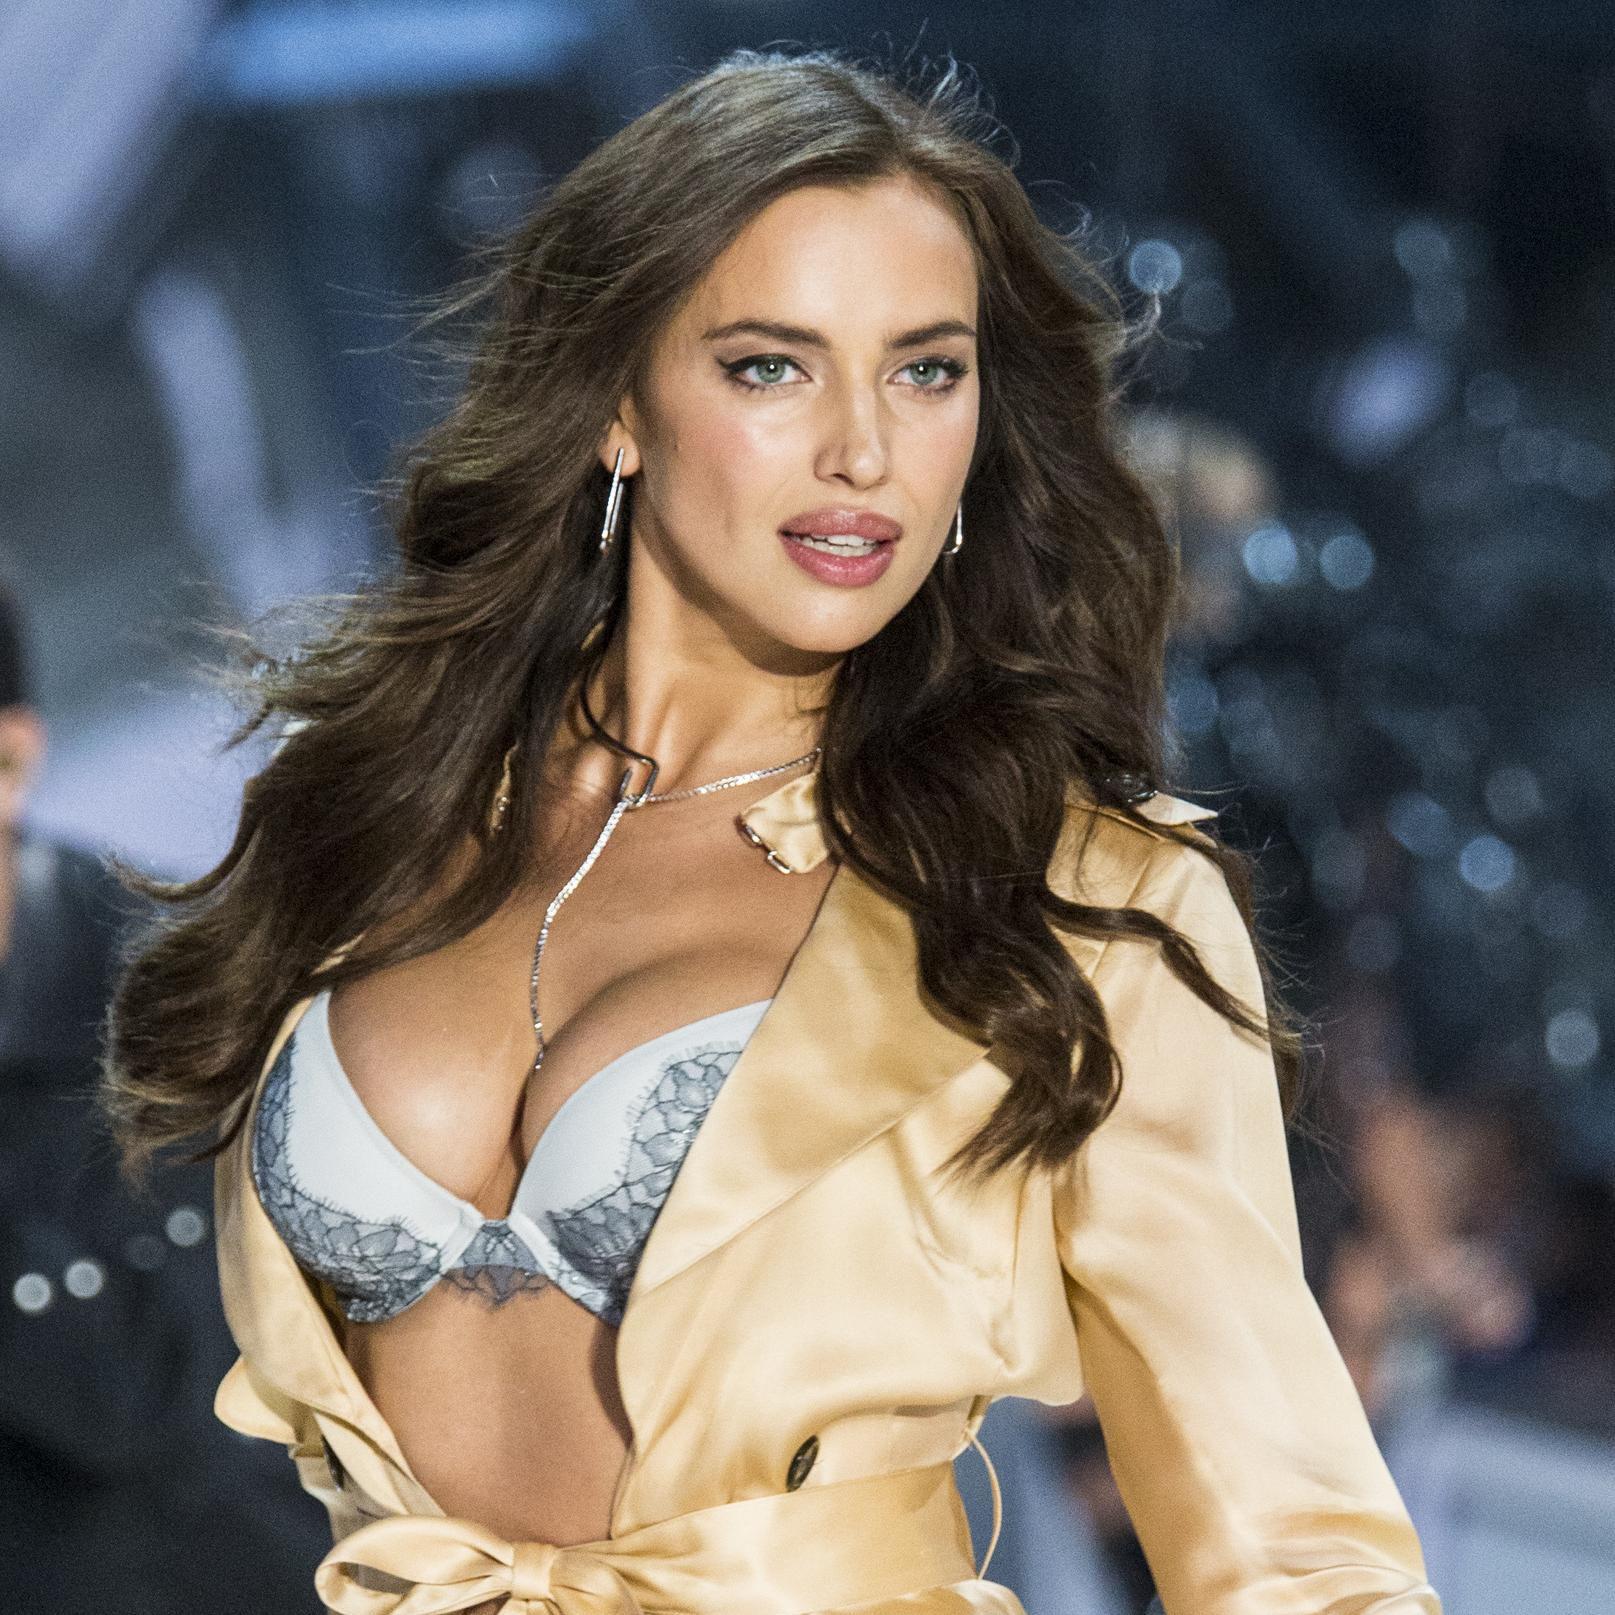 Ona to može: Irina Shayk prošetala u pidžami zavodljivog dekoltea